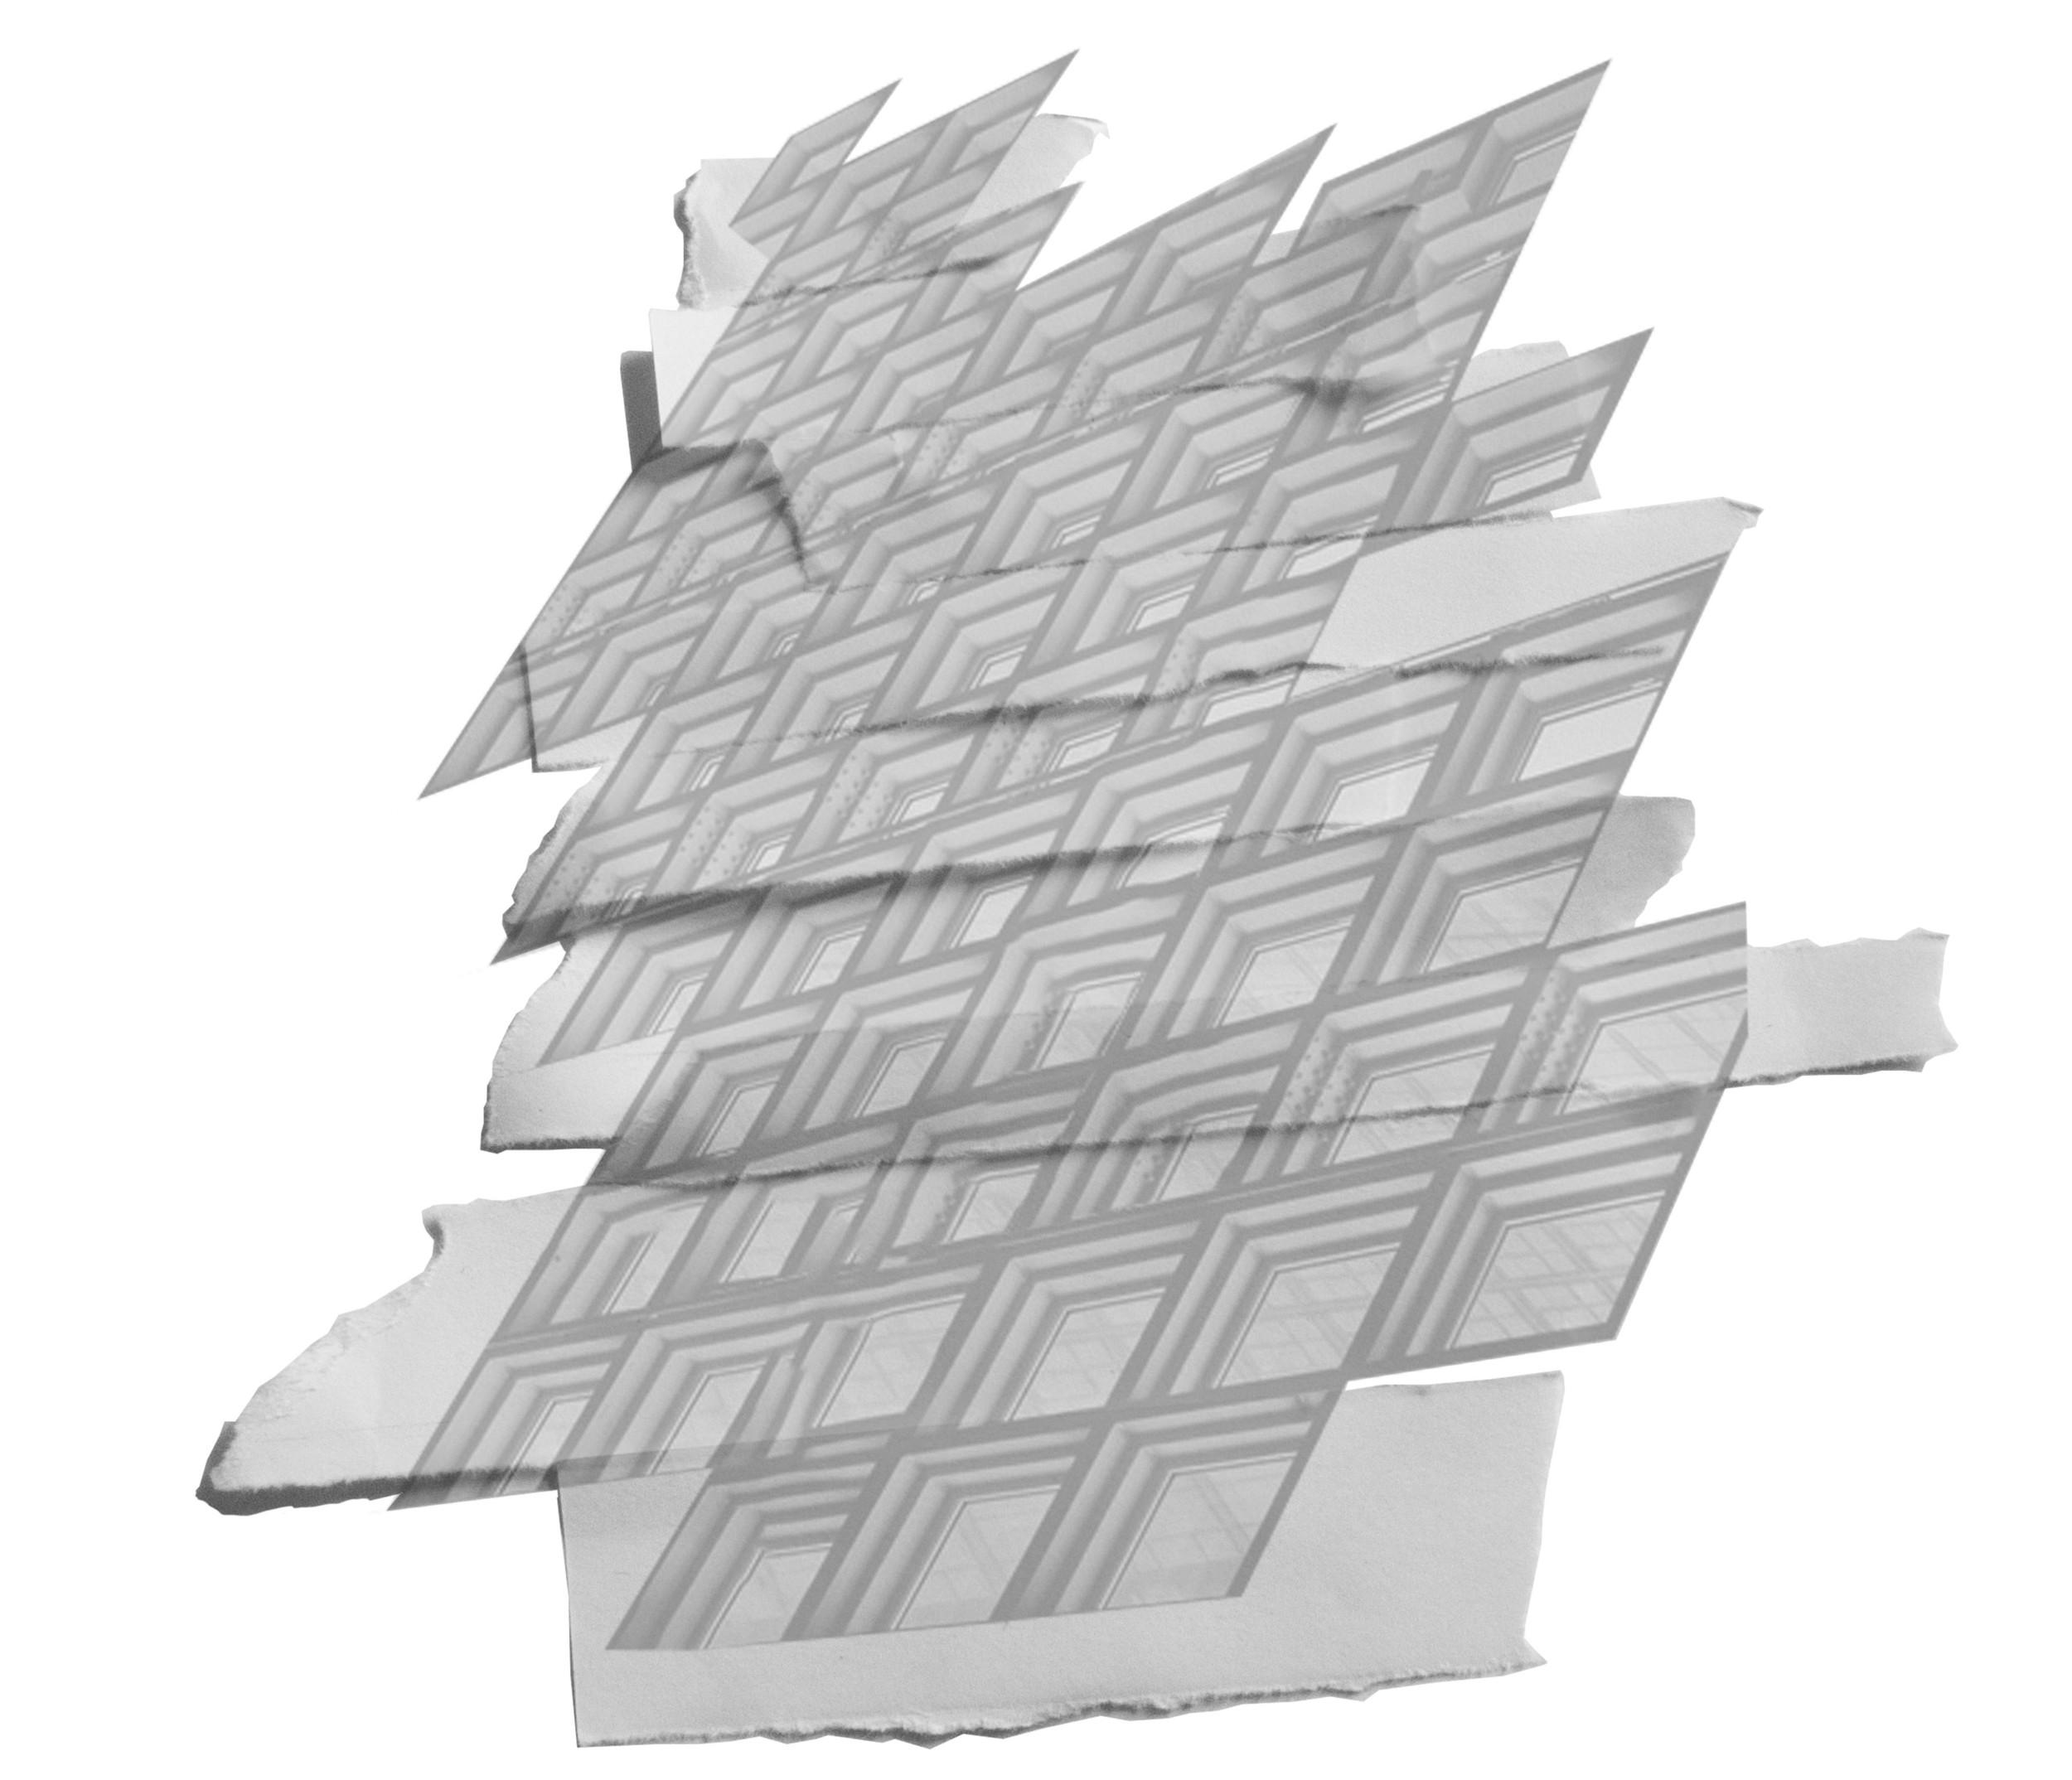 ripped paper_cut photo_white_photo_cutout_all the way.jpg